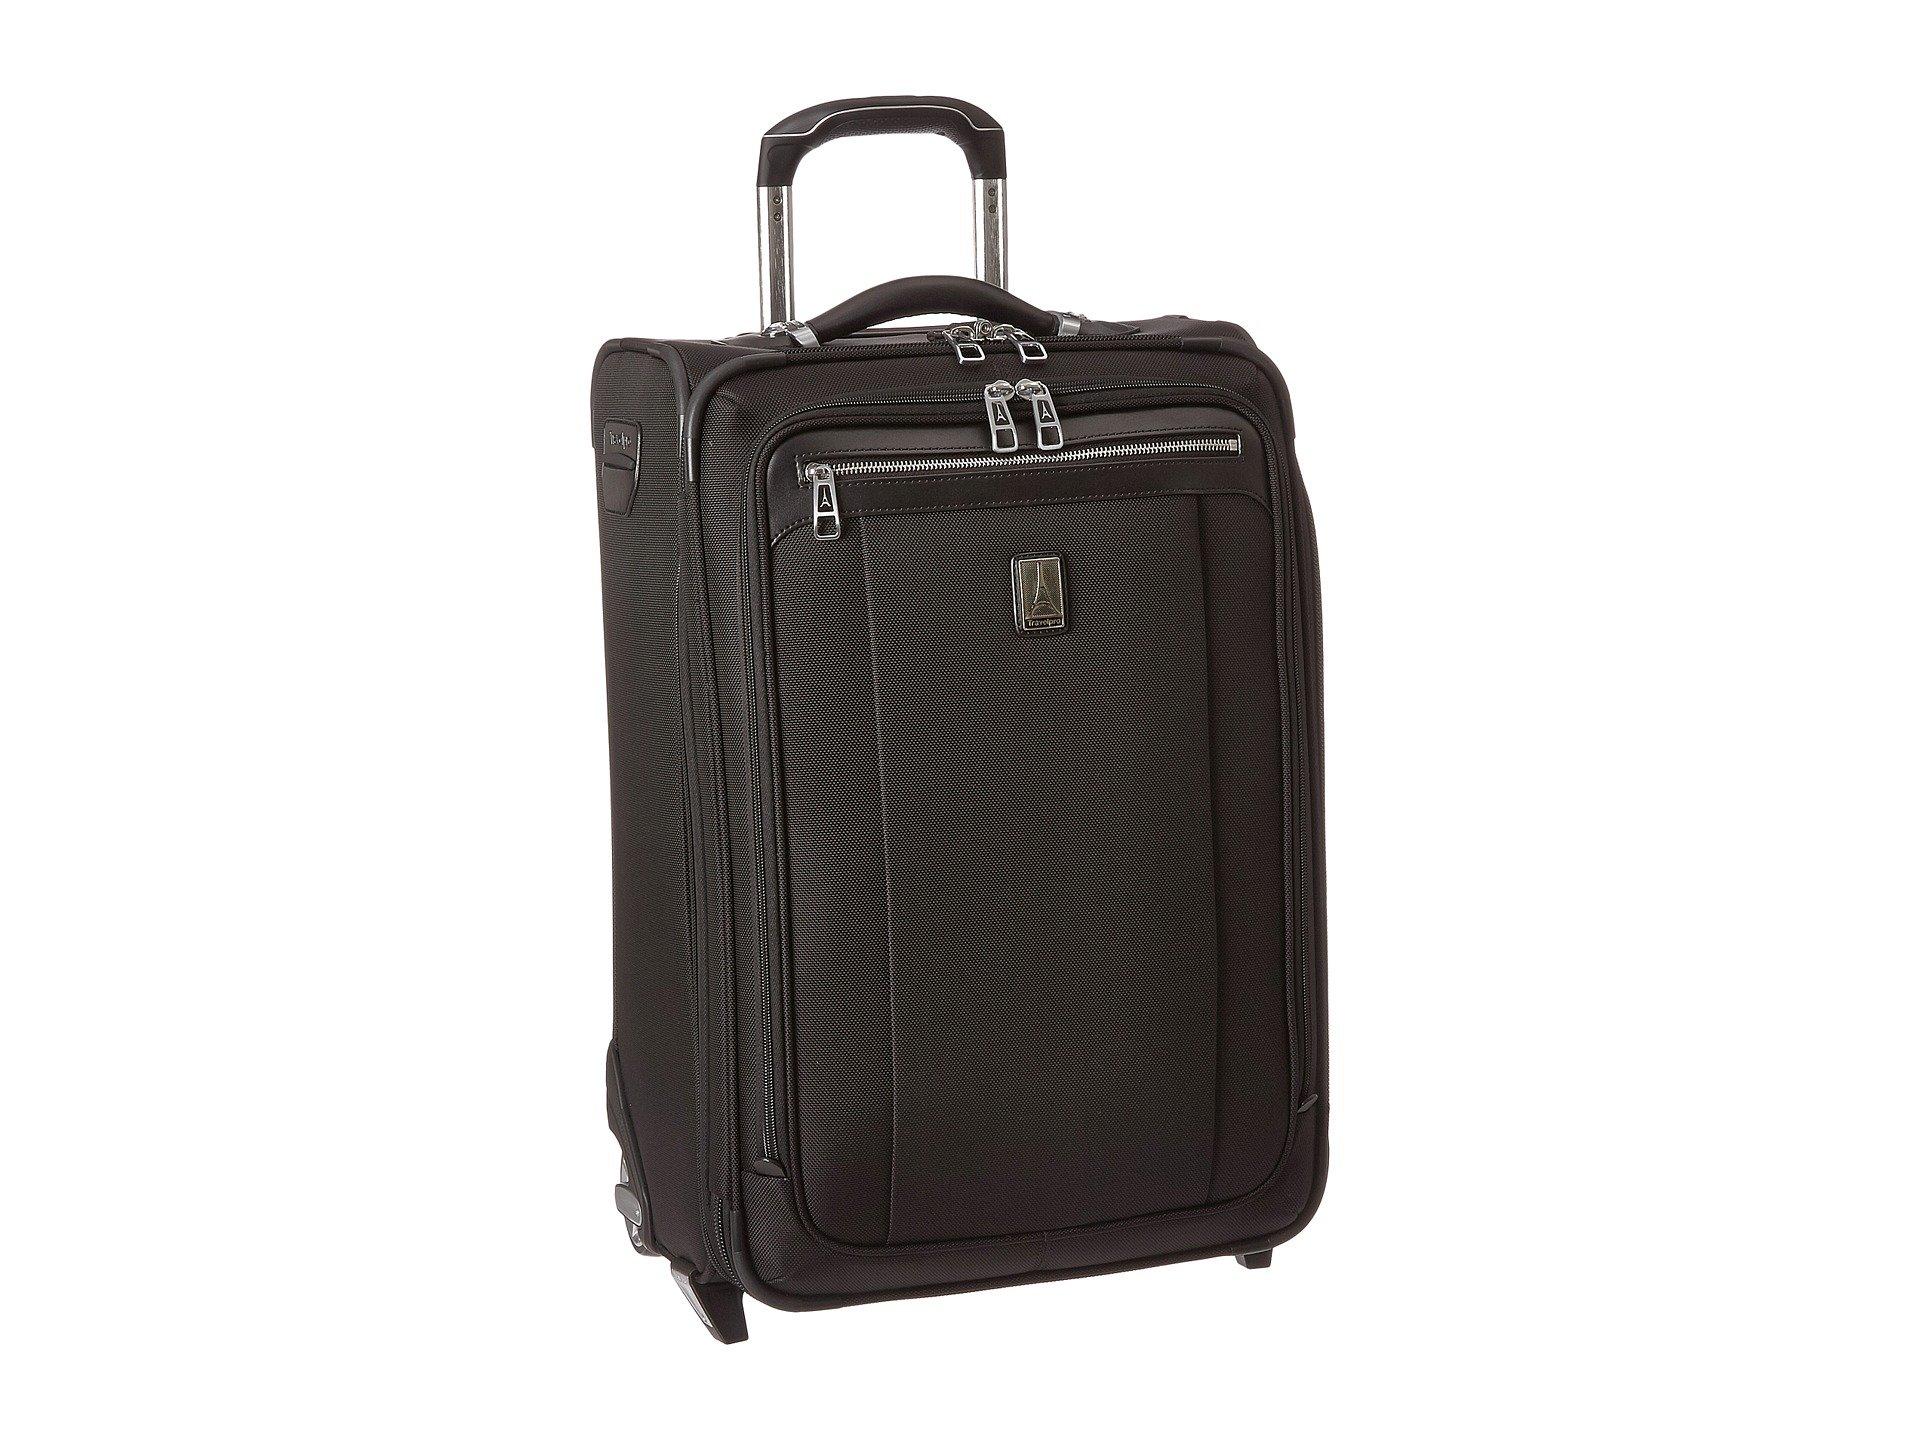 Black Rollaboard Suiter Expandable Travelpro 22